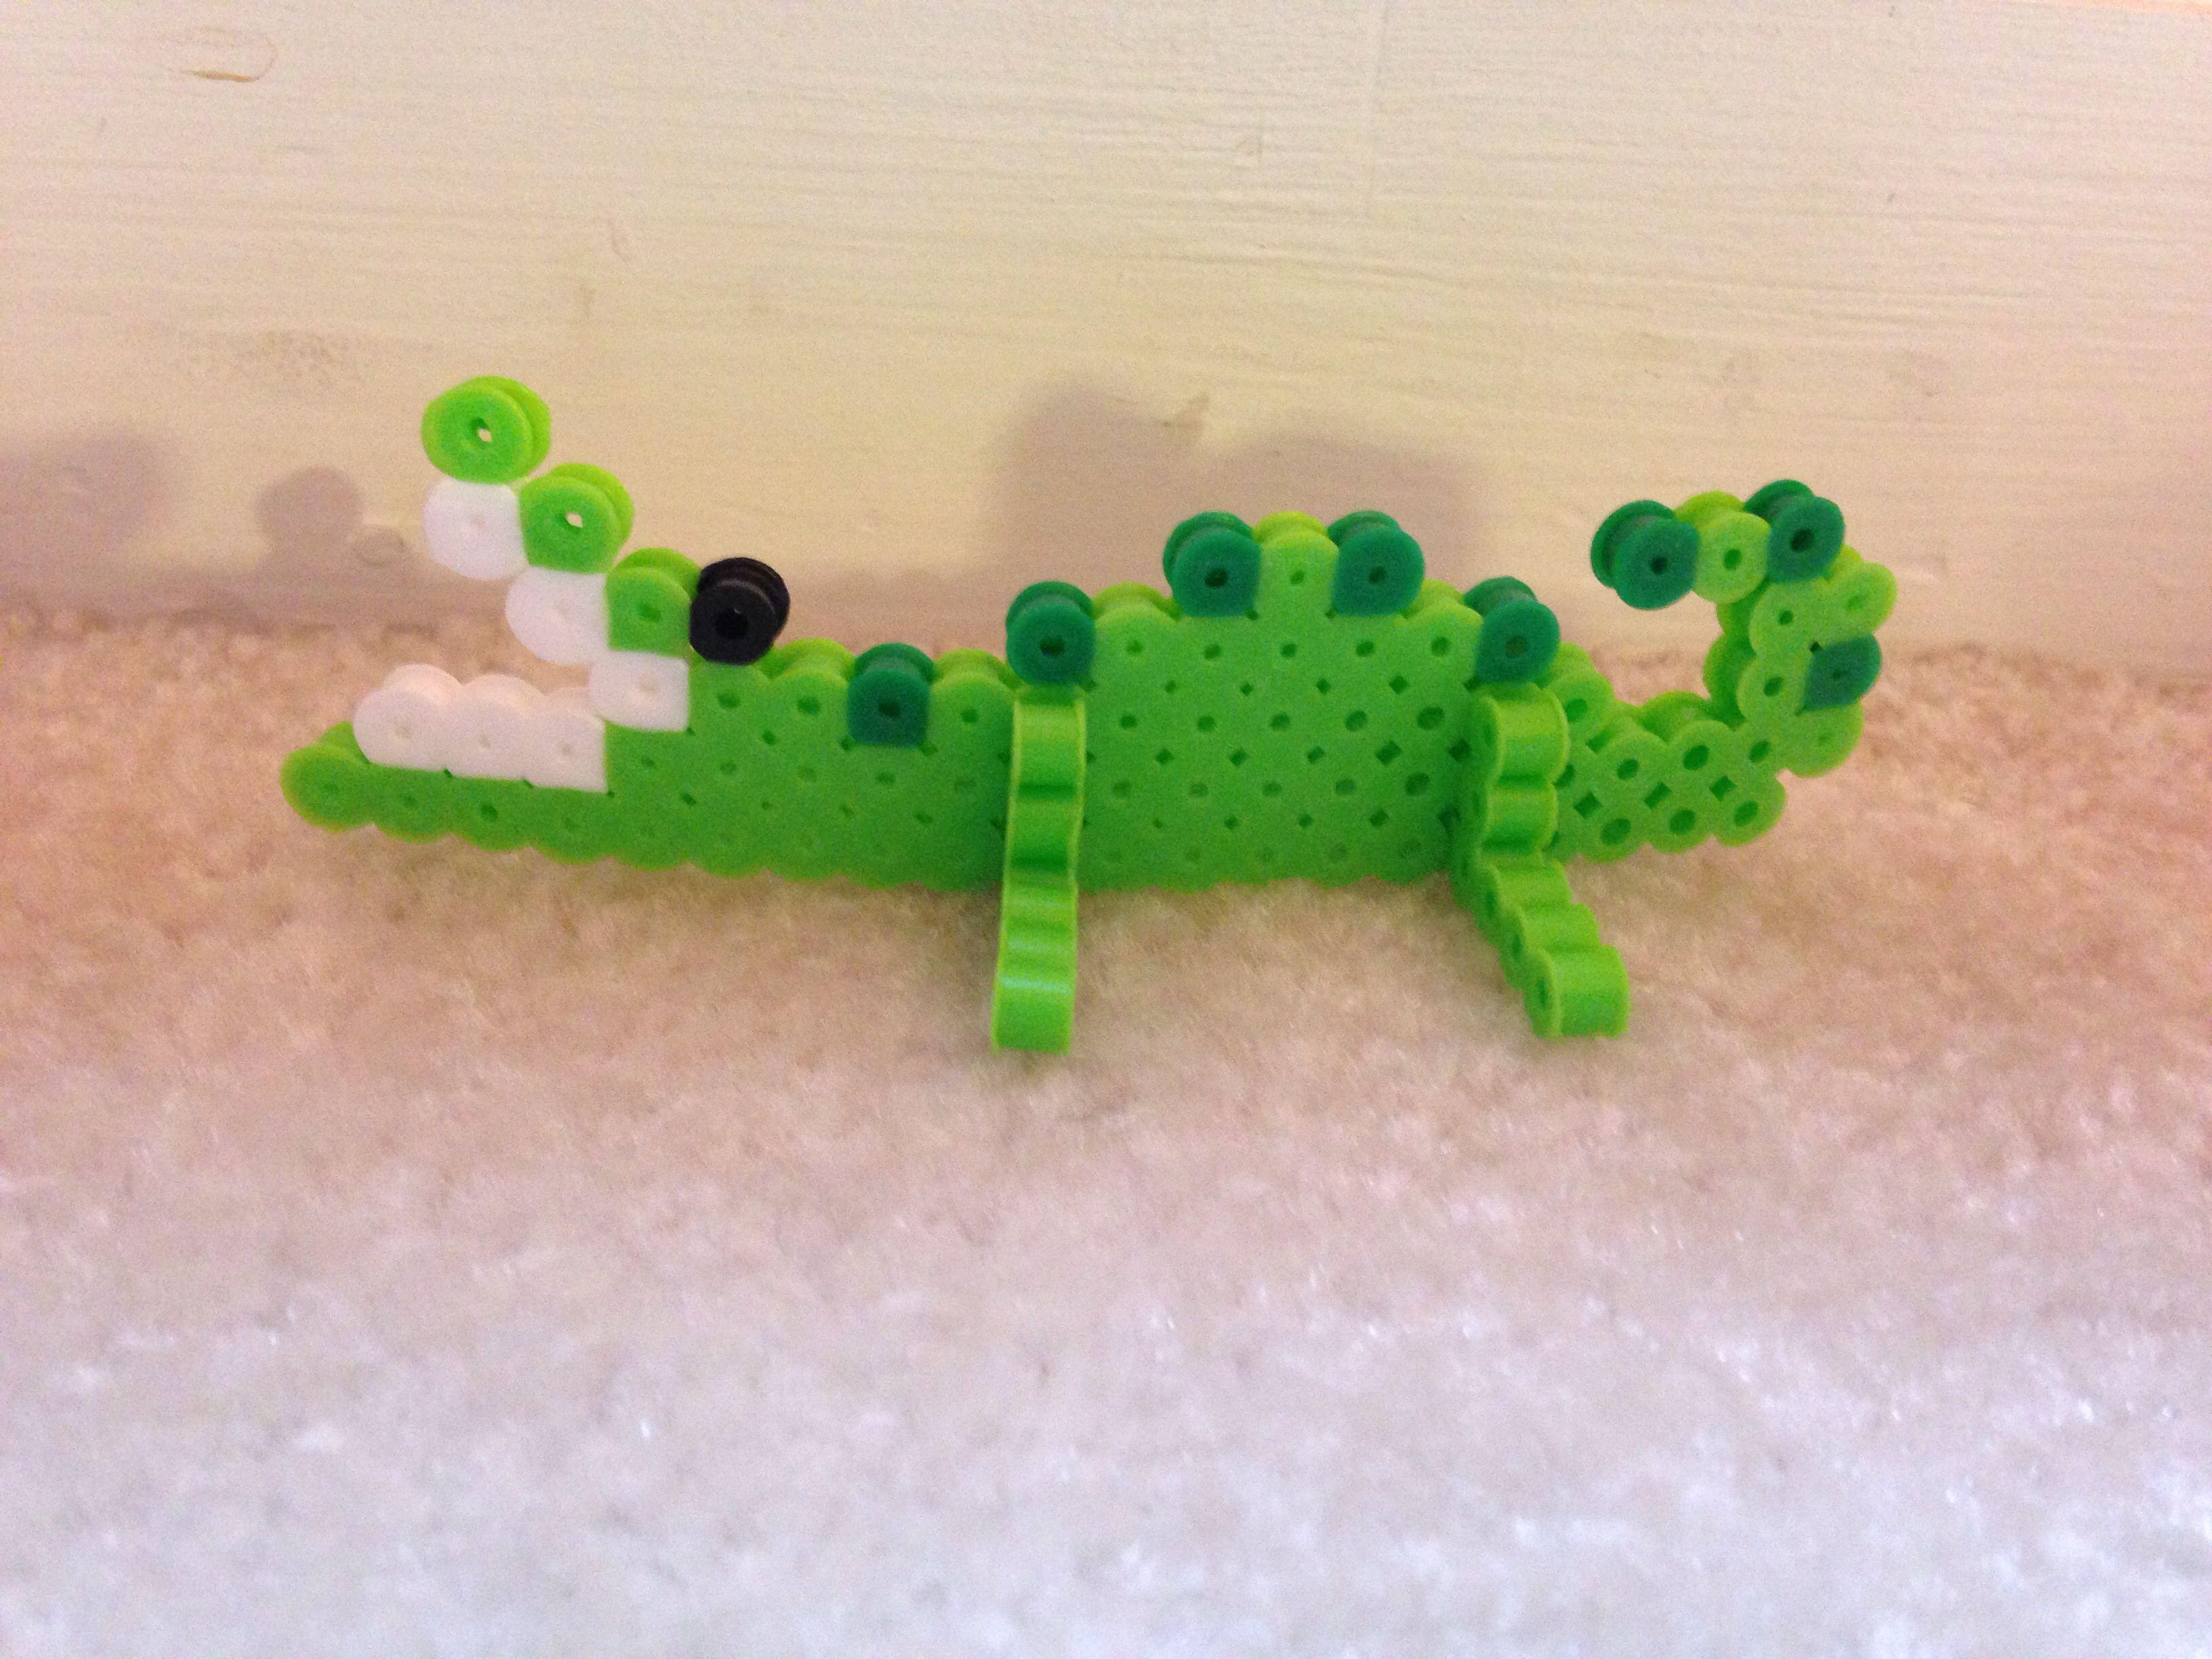 Green 3 D Alligator Made Of Perler Beads Perler Beads